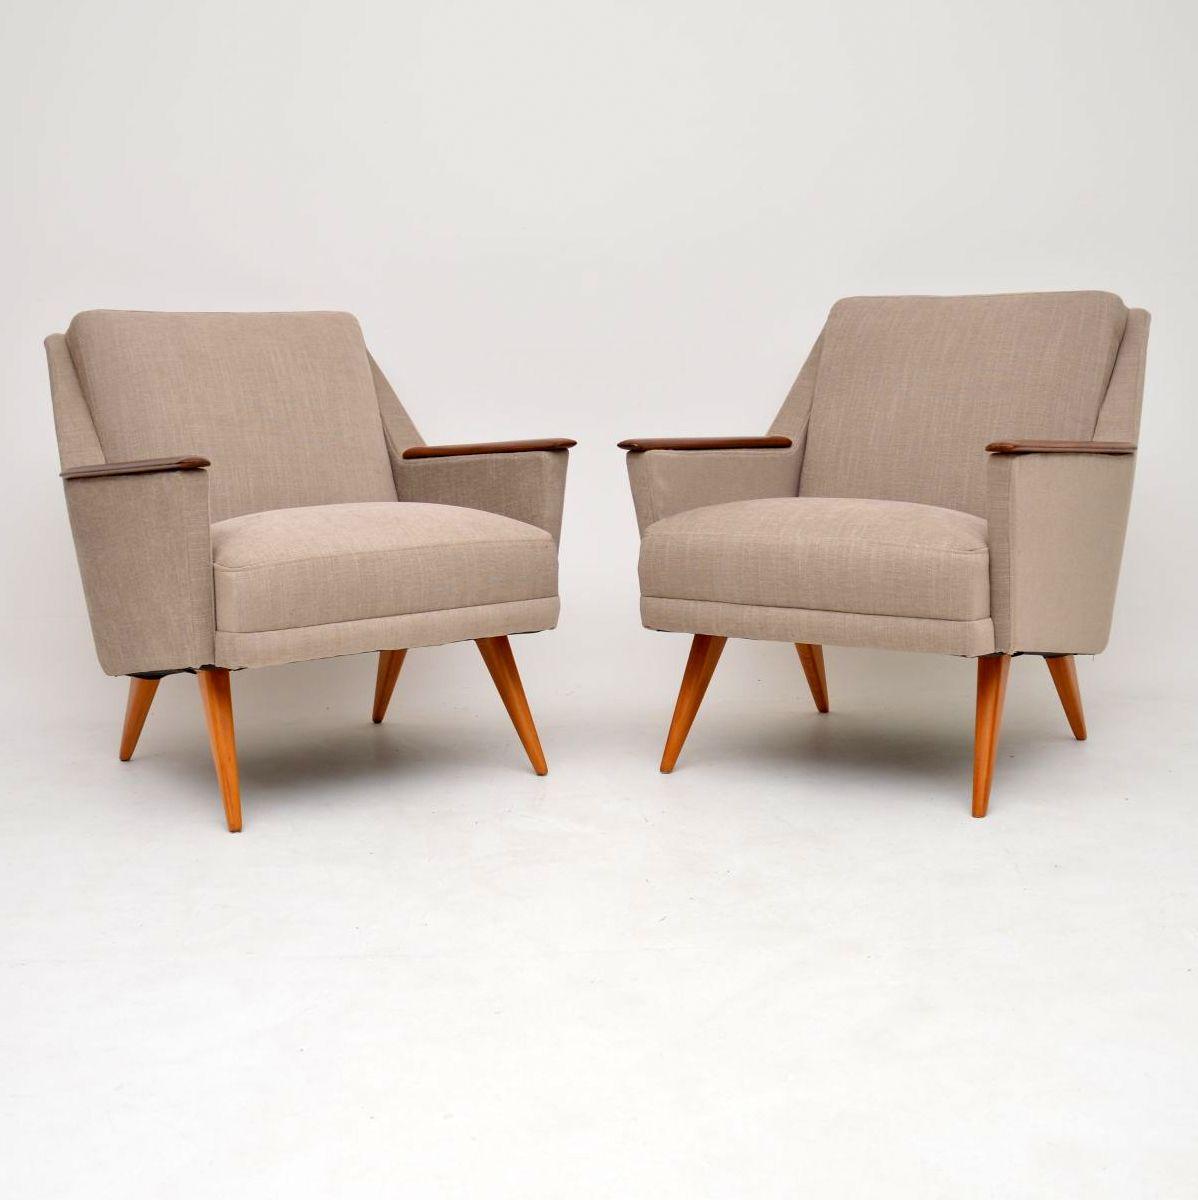 pair of vintage retro danish armchairs